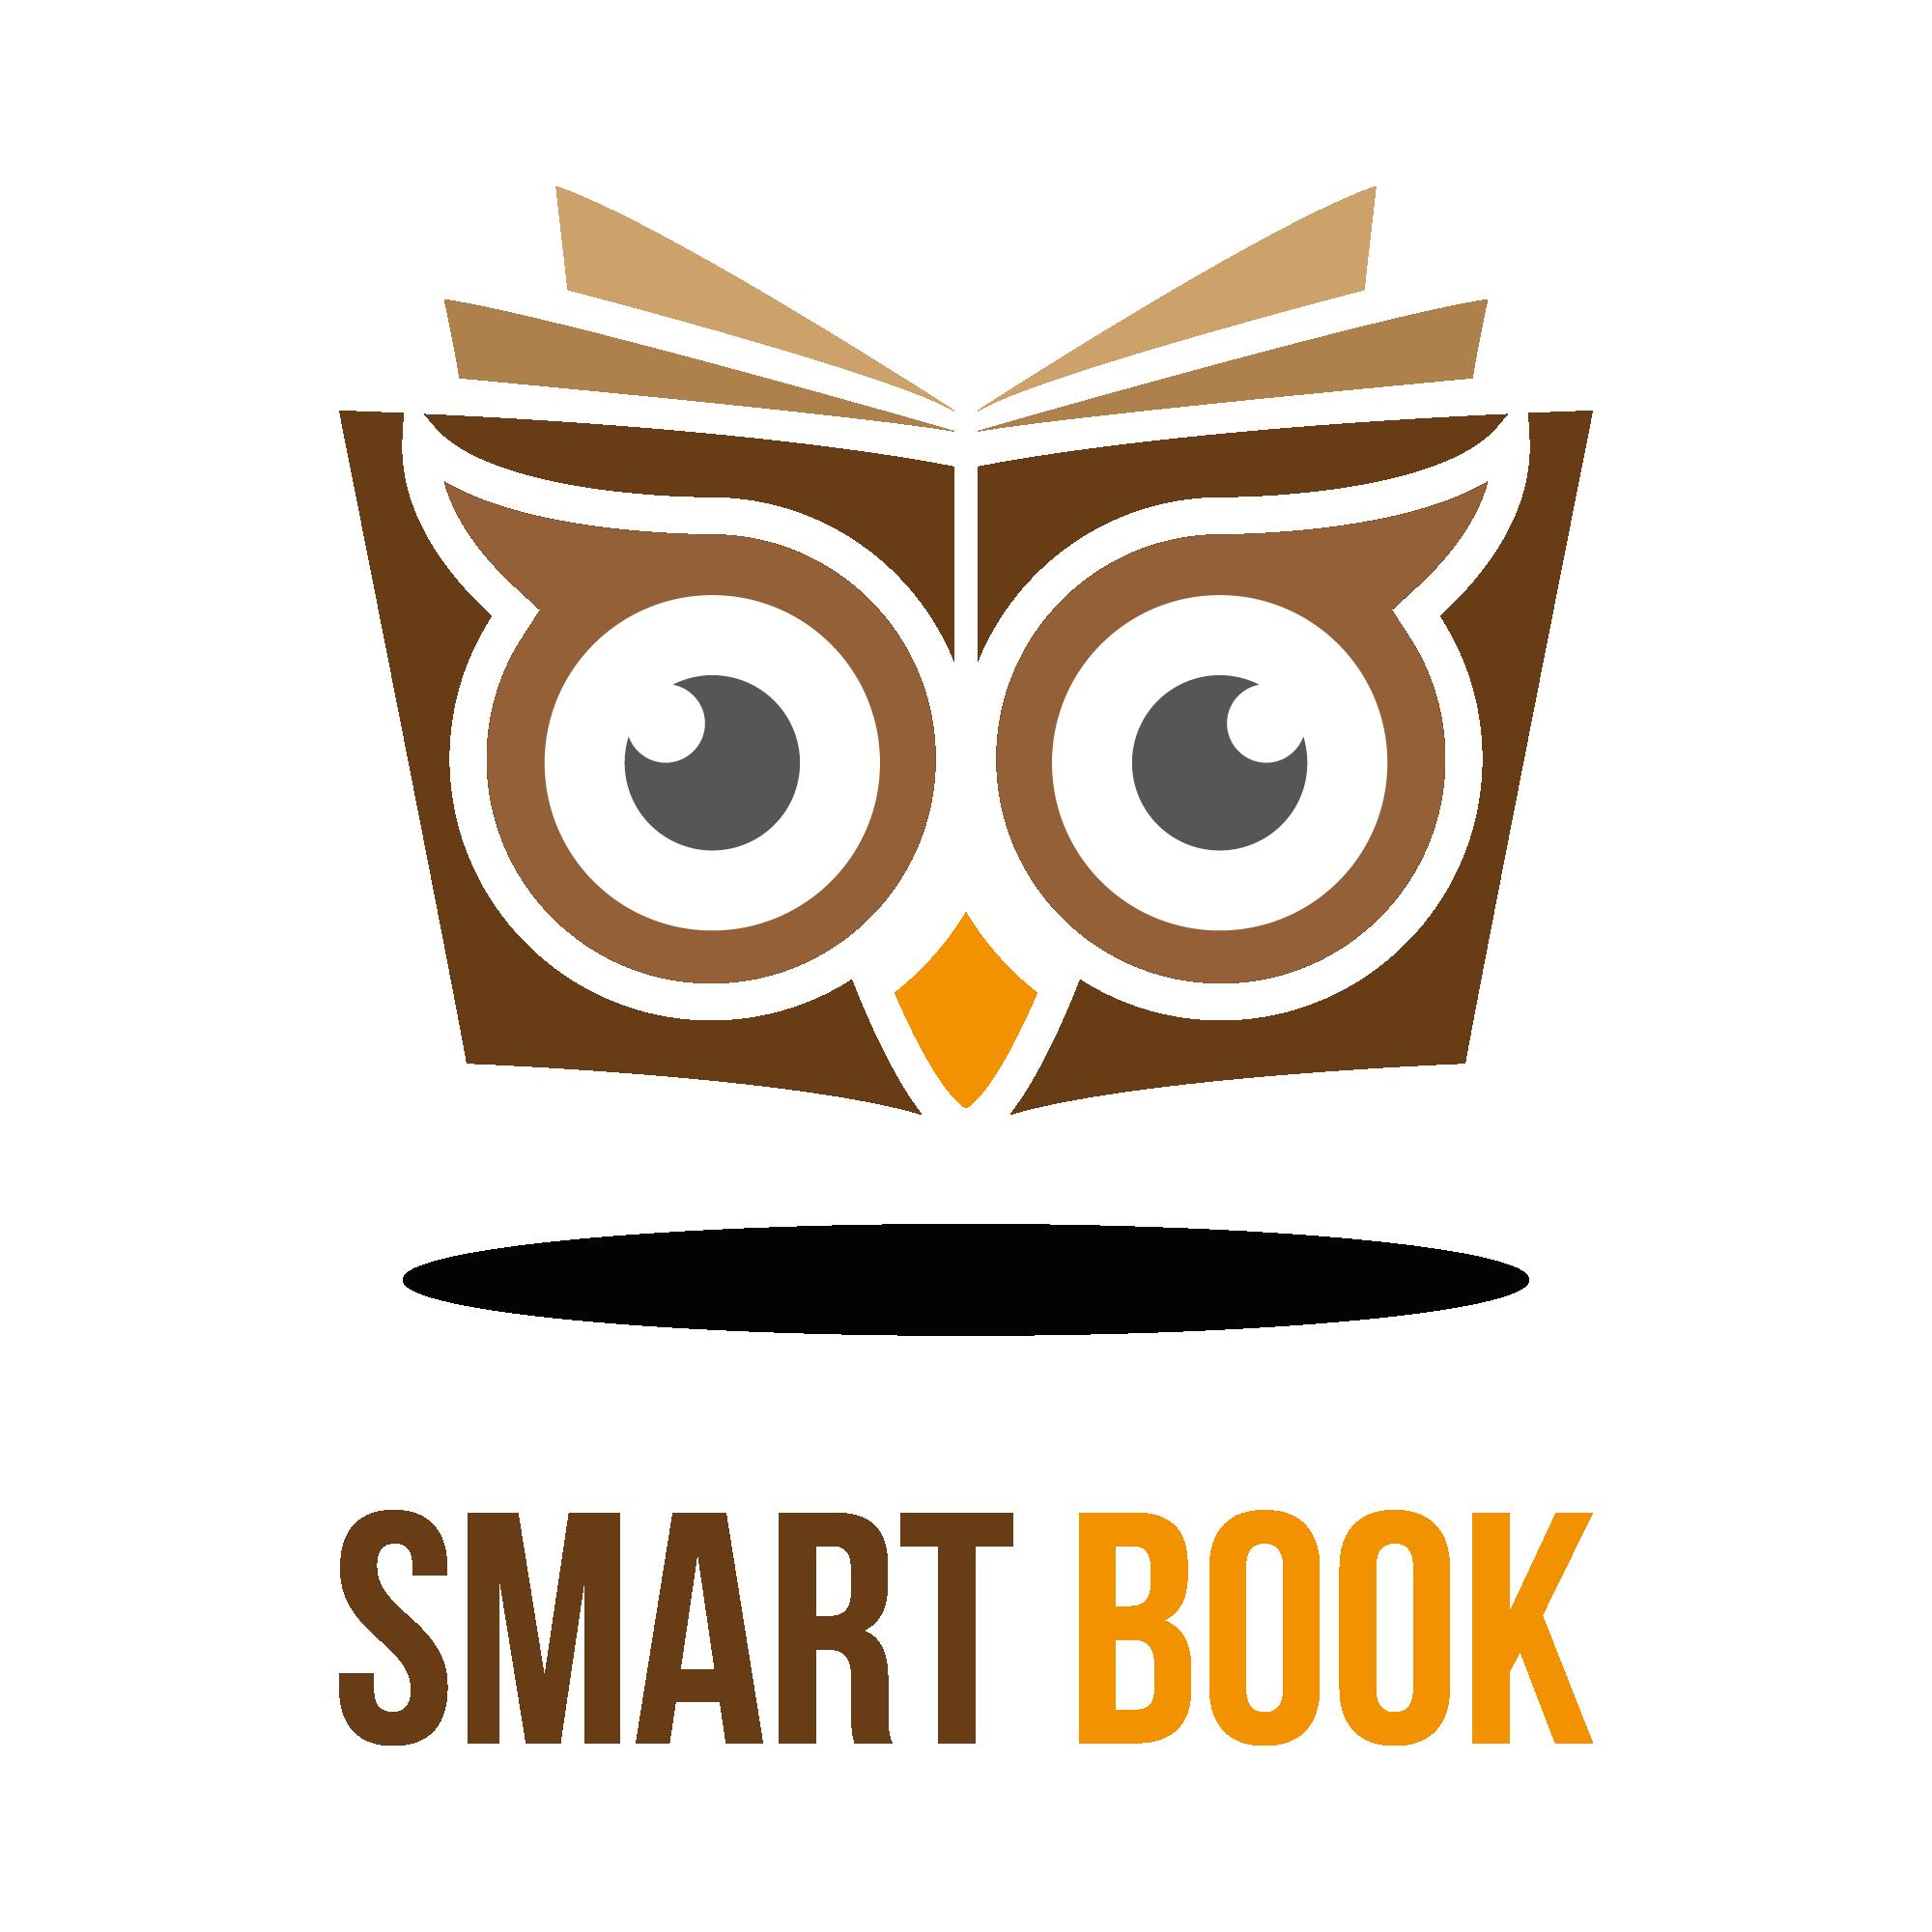 Textbook clipart log book. Znalezione obrazy dla zapytania